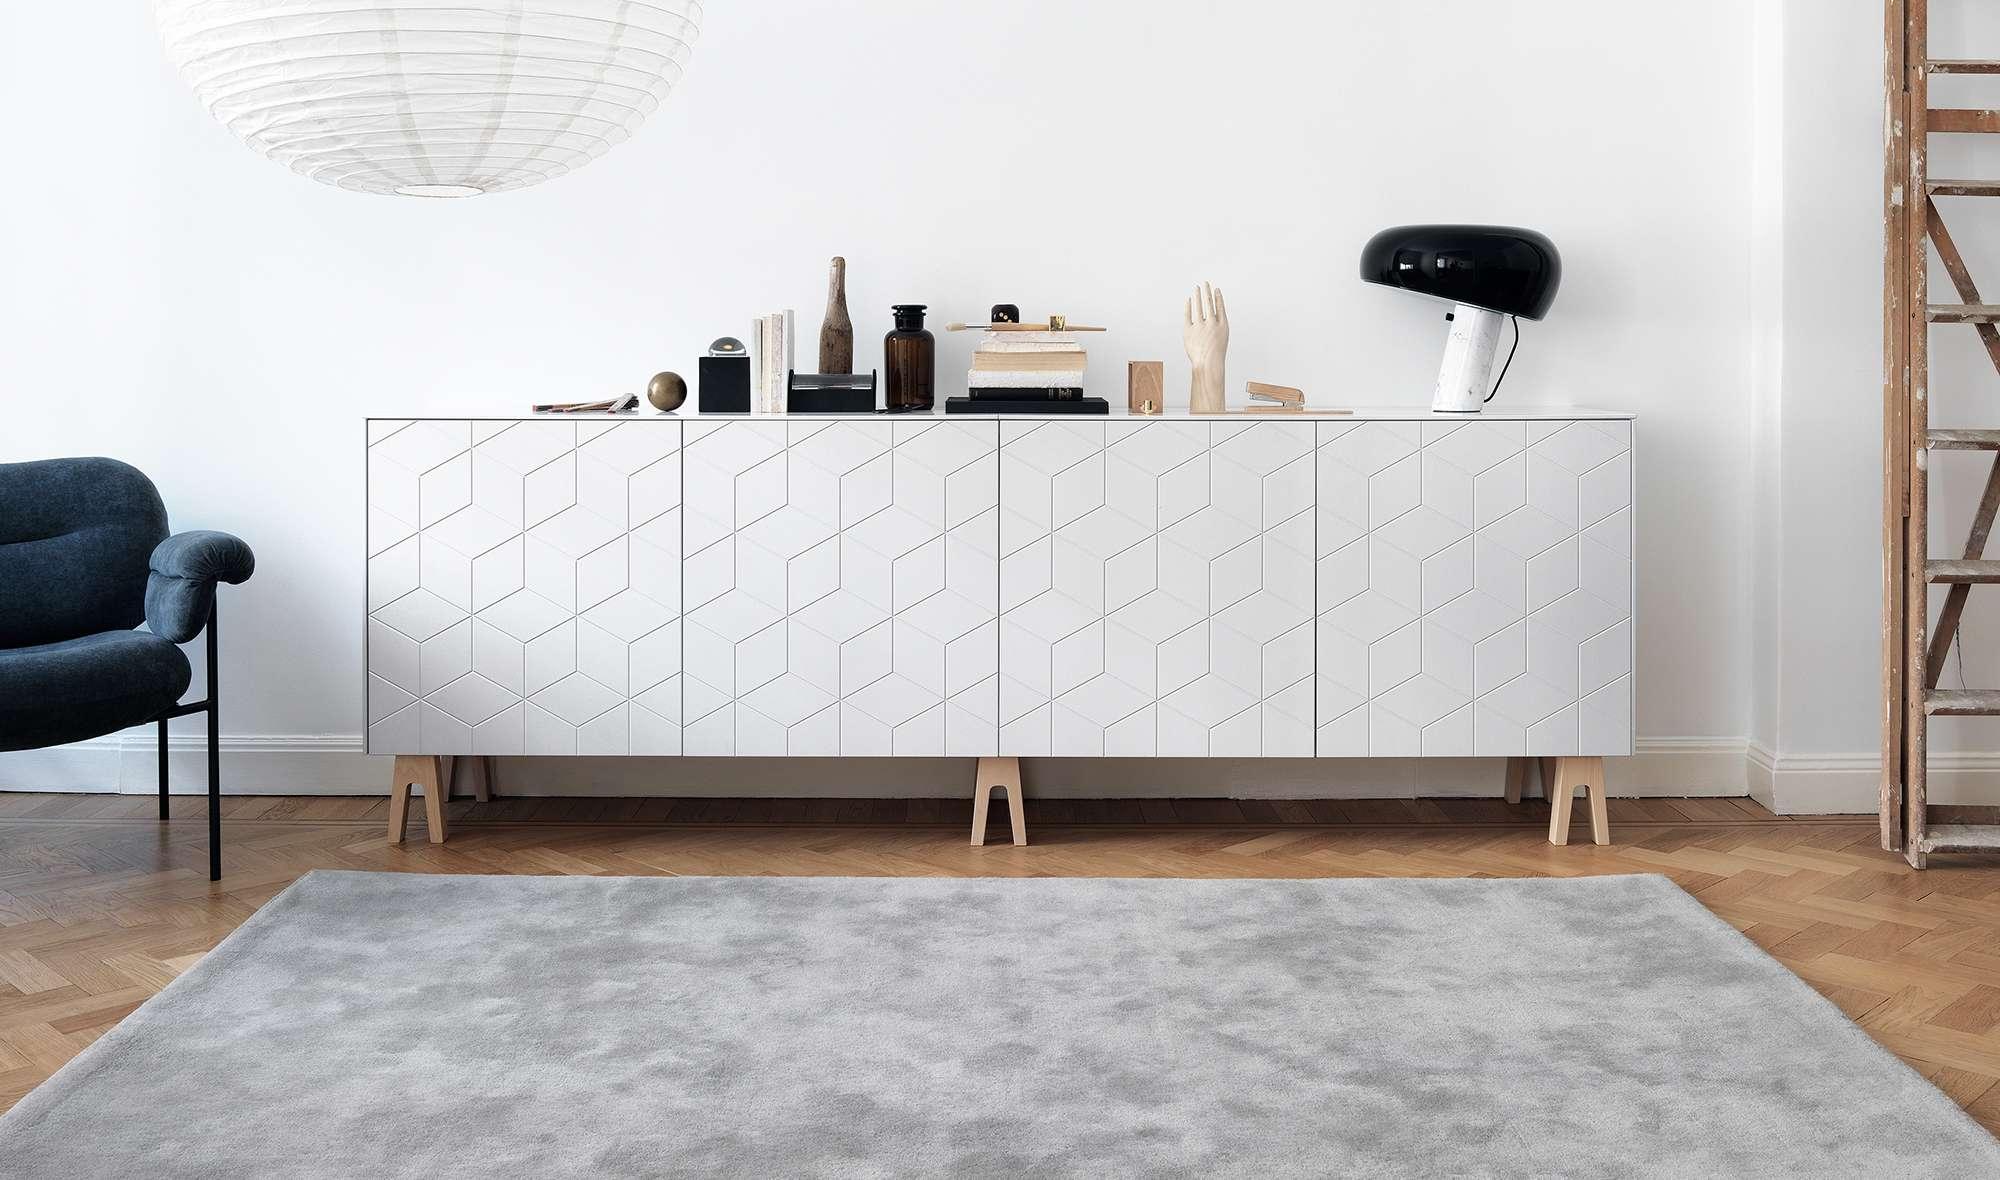 Uncategorized : Ehrfürchtiges Ikea Besta Inspiration Ebenfalls With Regard To Ikea Besta Sideboards (View 3 of 20)